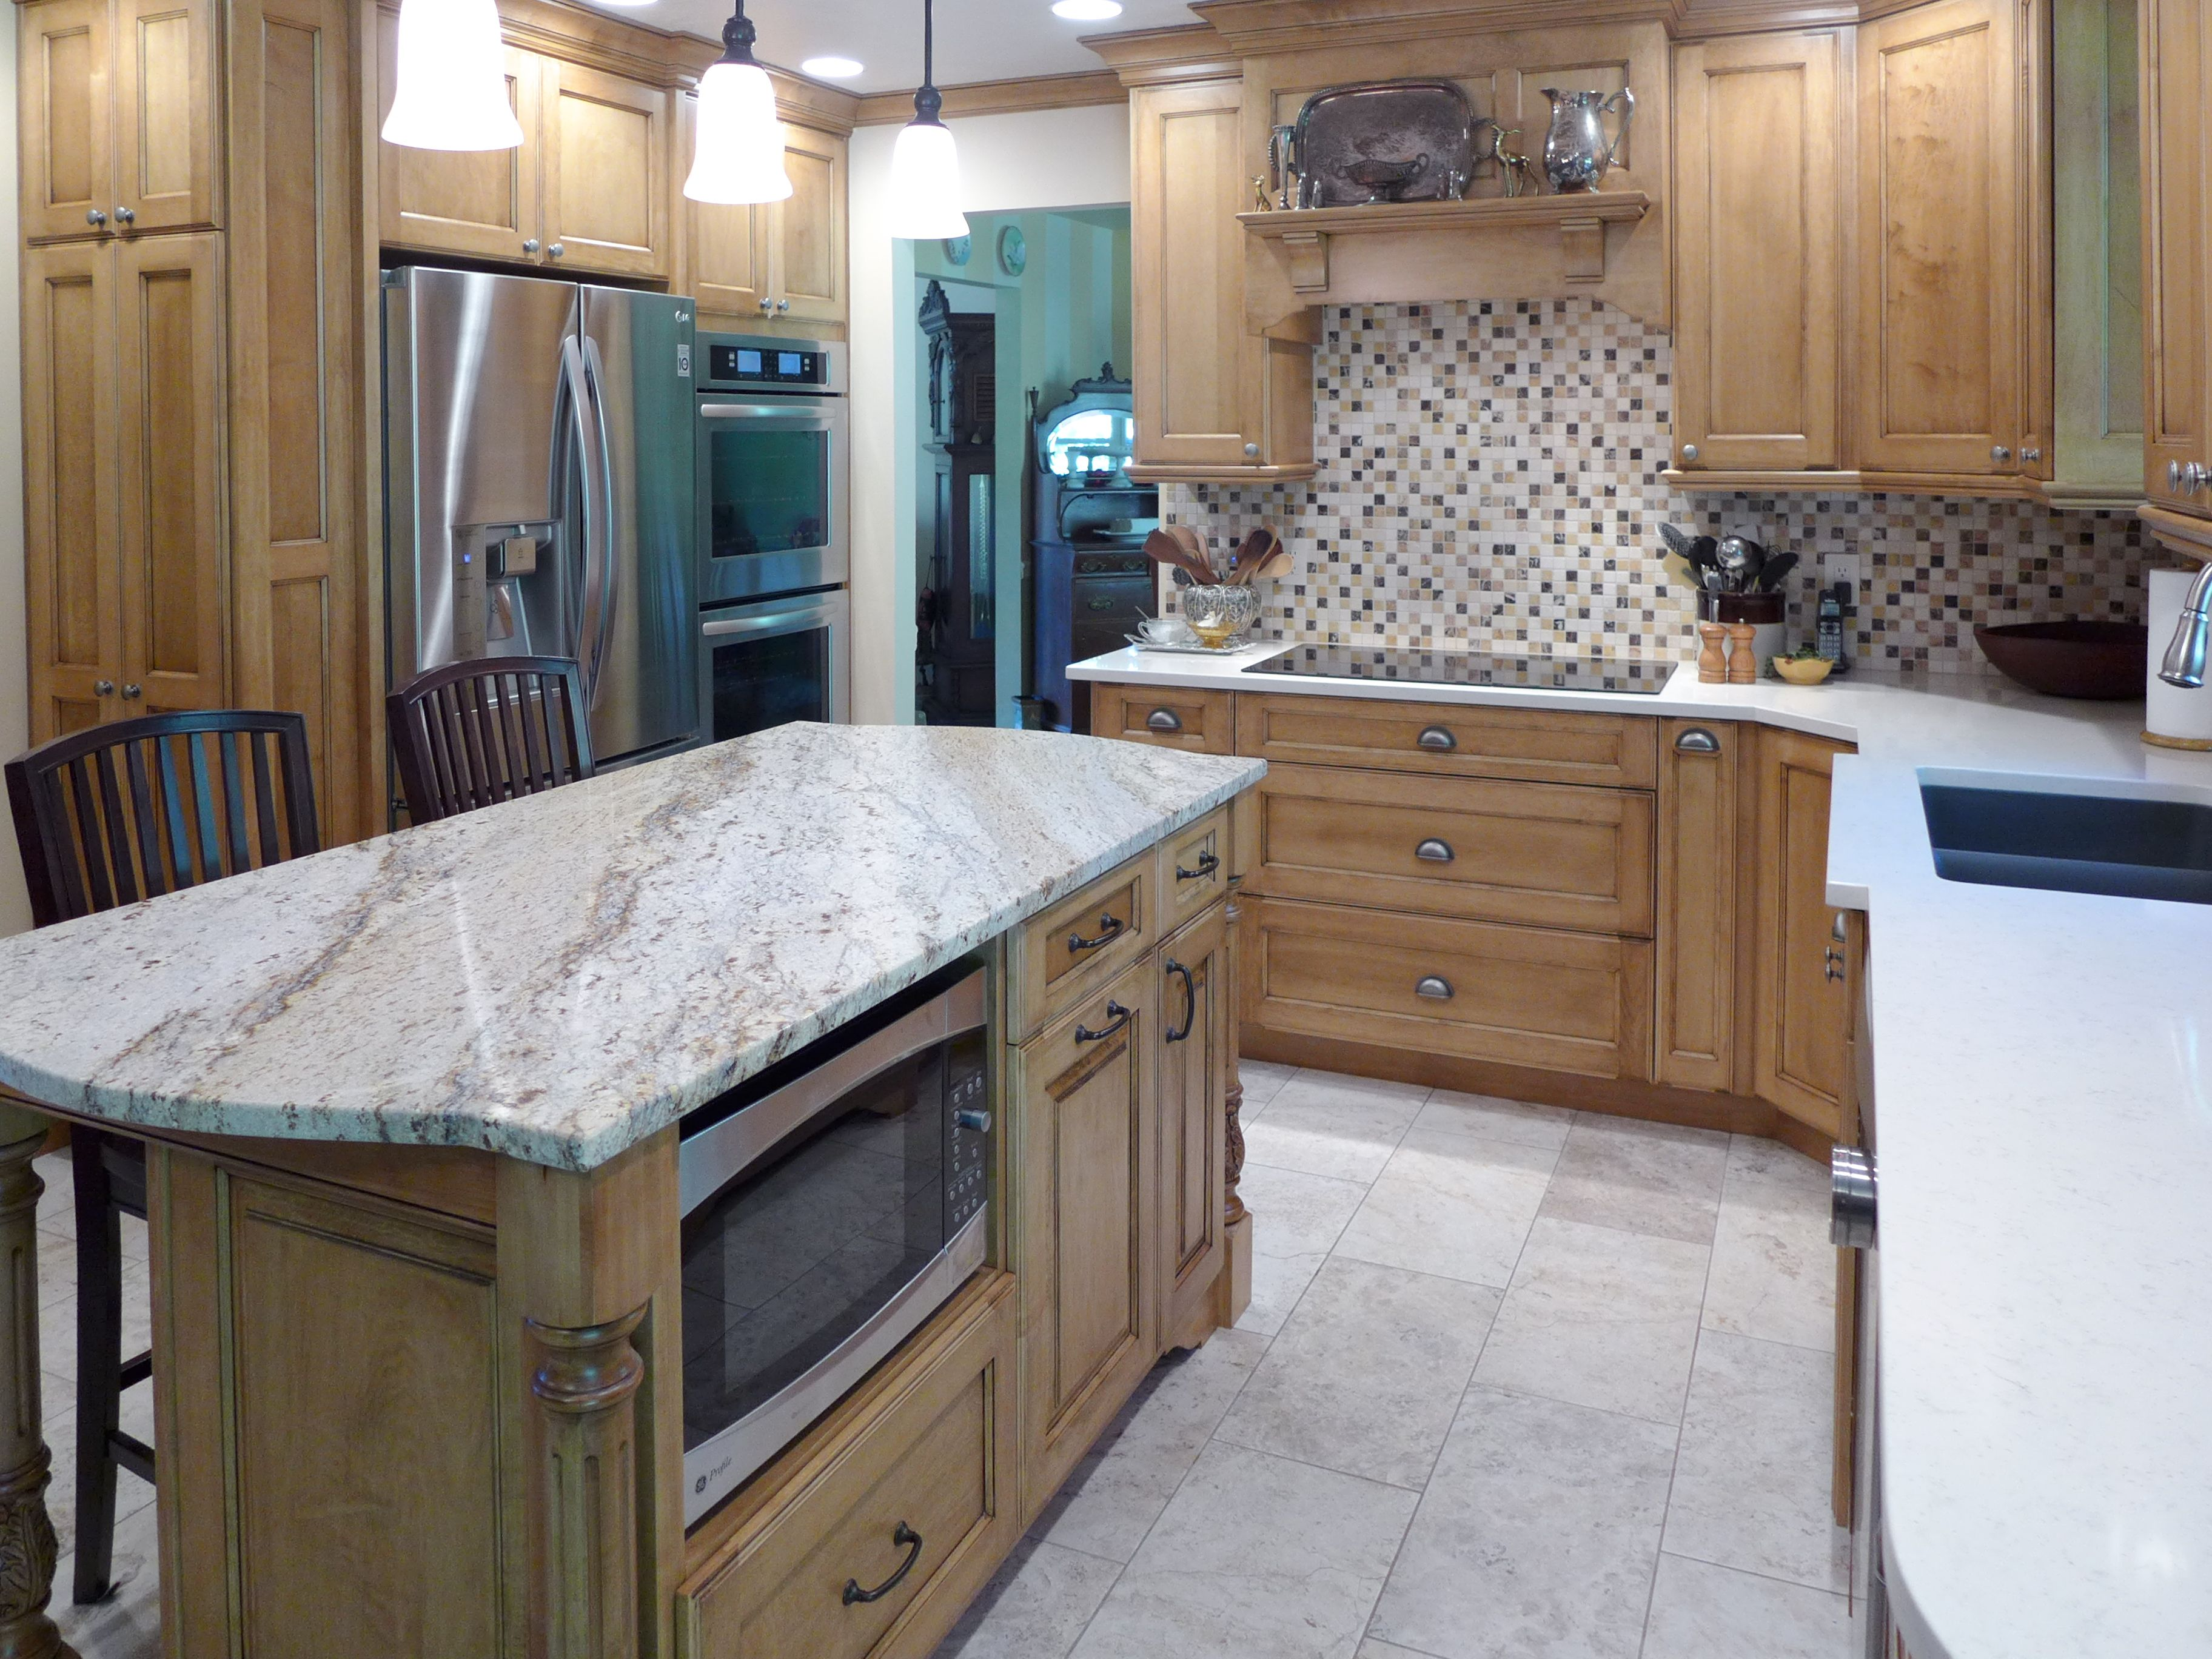 Quartz Kitchen Countertops Cabinet Outlet Remodel Vortium Silestone Countertop With